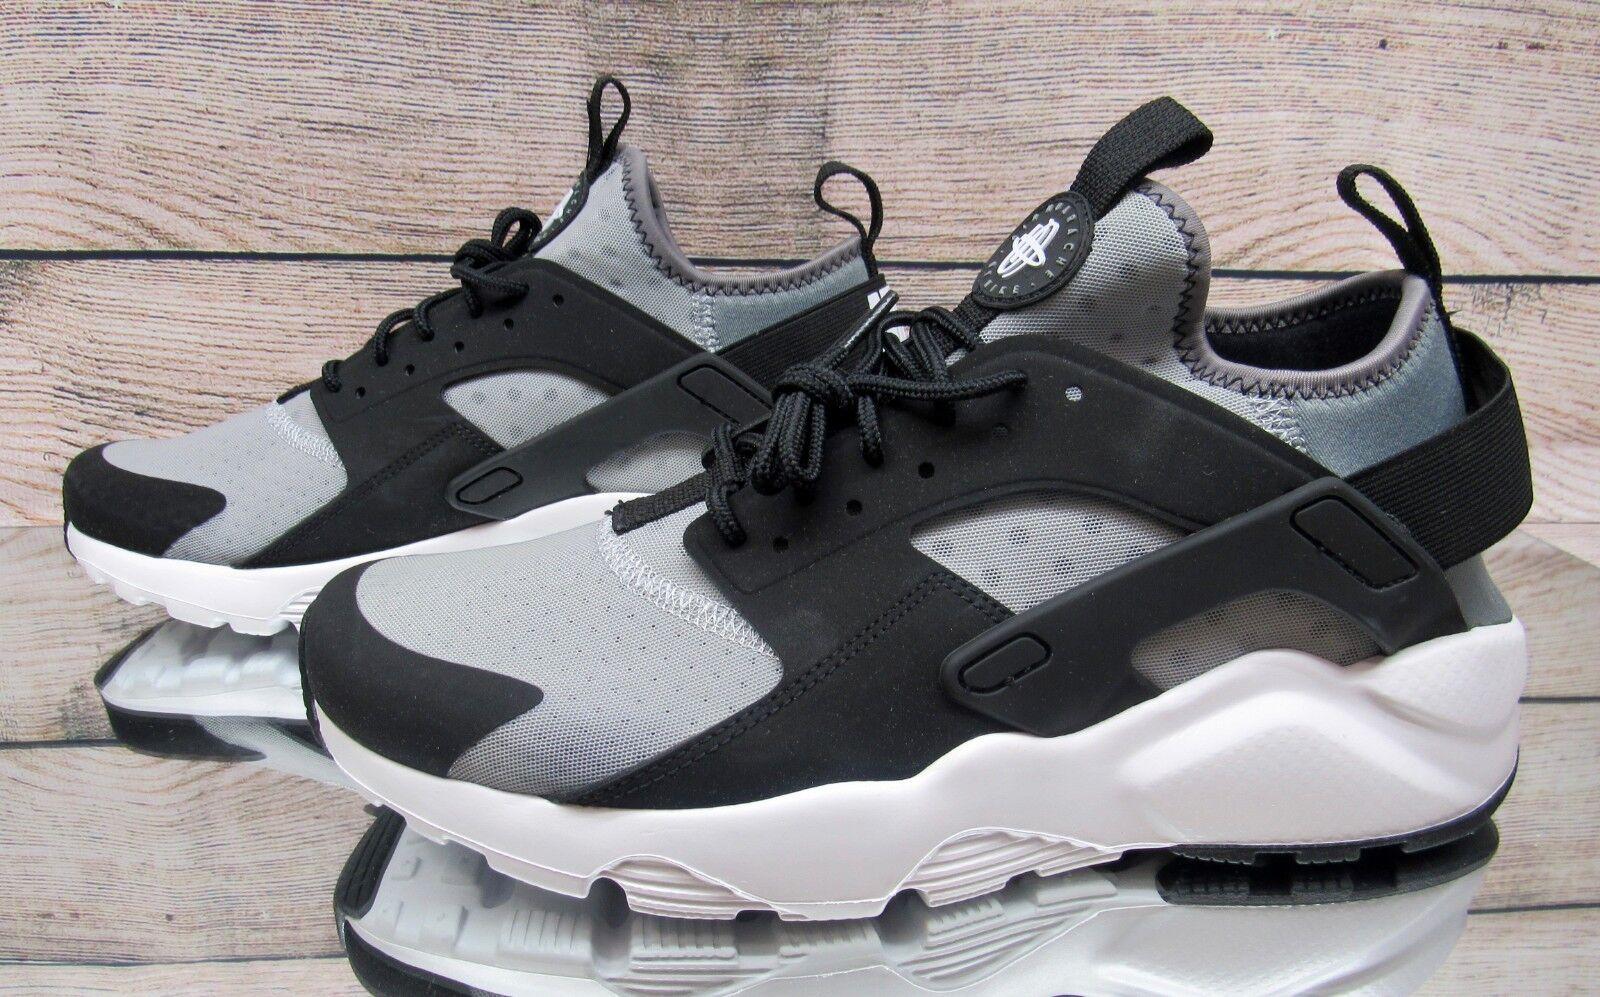 Nike air huarache laufen ultra wolf Grau  - schwarz 819685-010 schuhe 9.